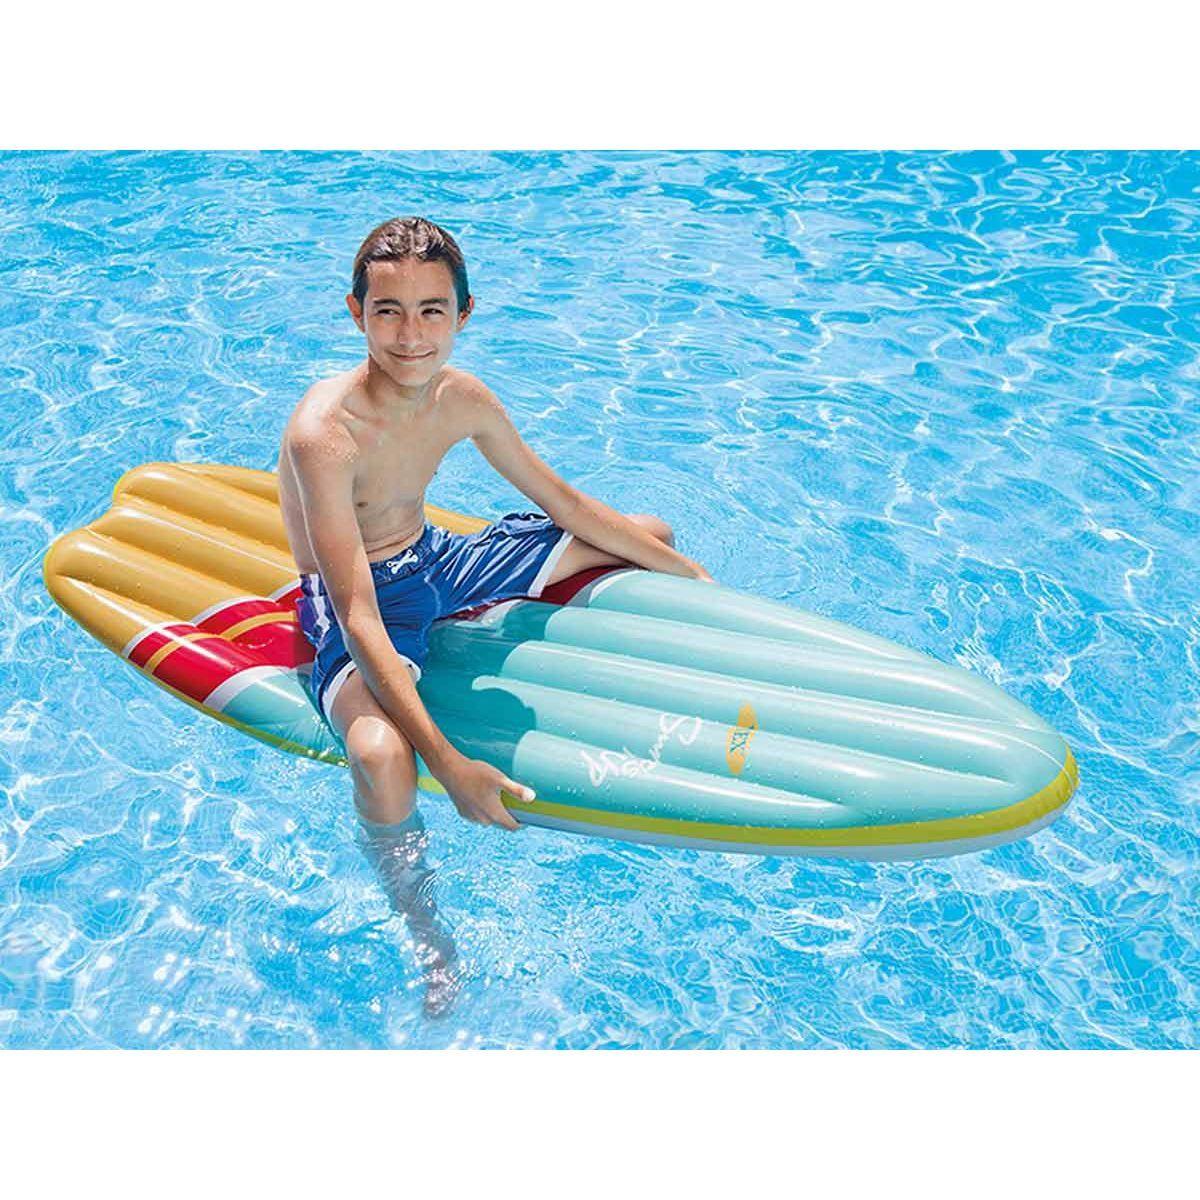 Matelas De Piscine Surf - Intex - Taille : Taille Unique ... pour Matelas Piscine Intex